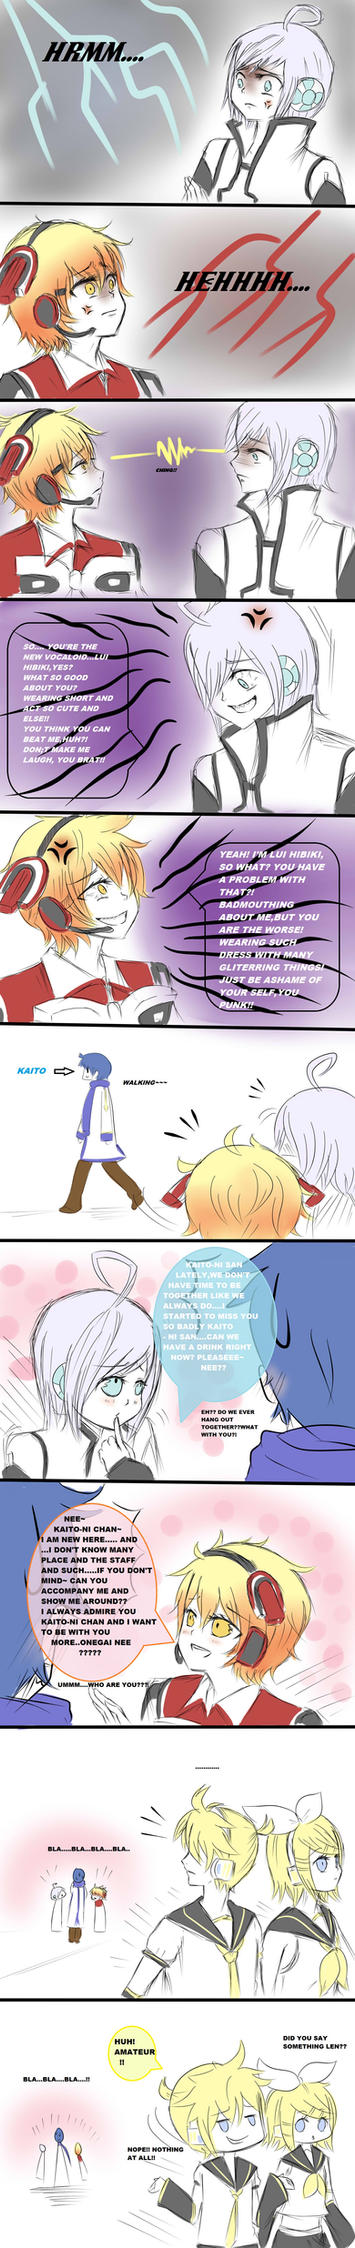 SHOTA fight!!(?) by akunohime01